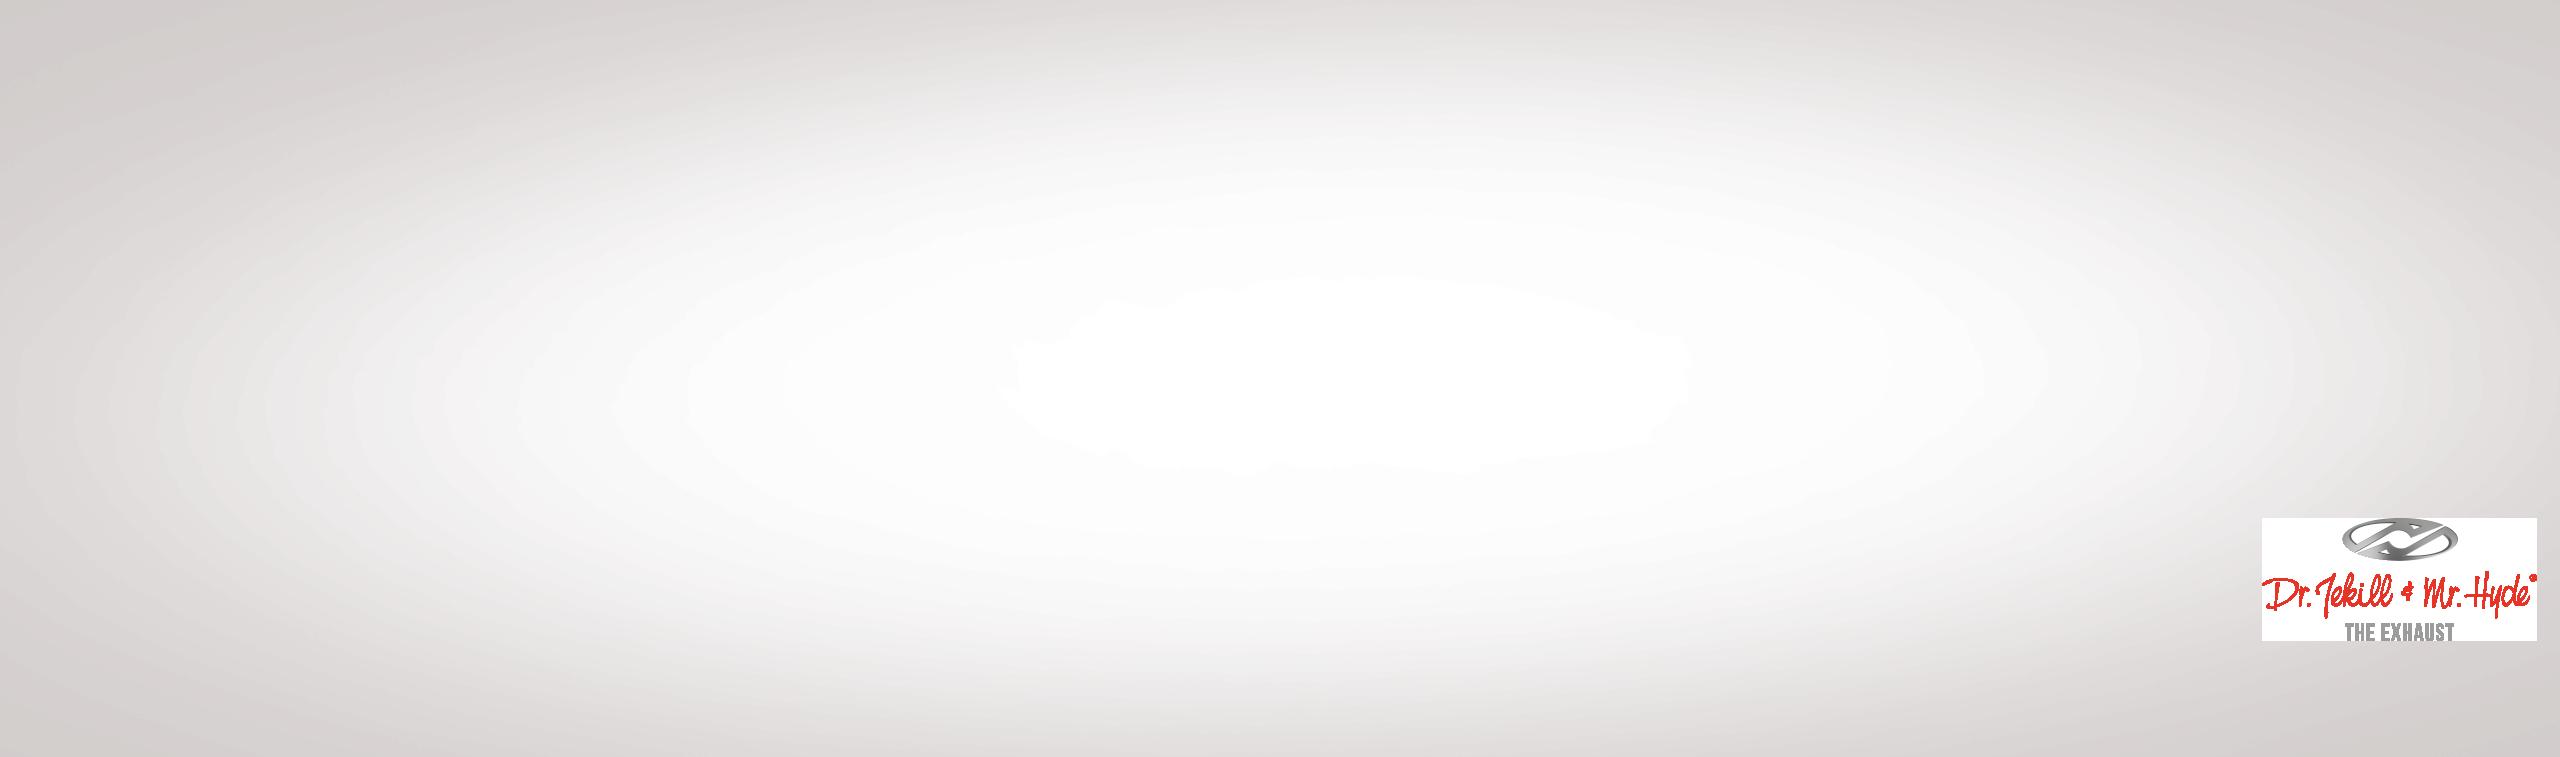 012 Logo JuH Slider